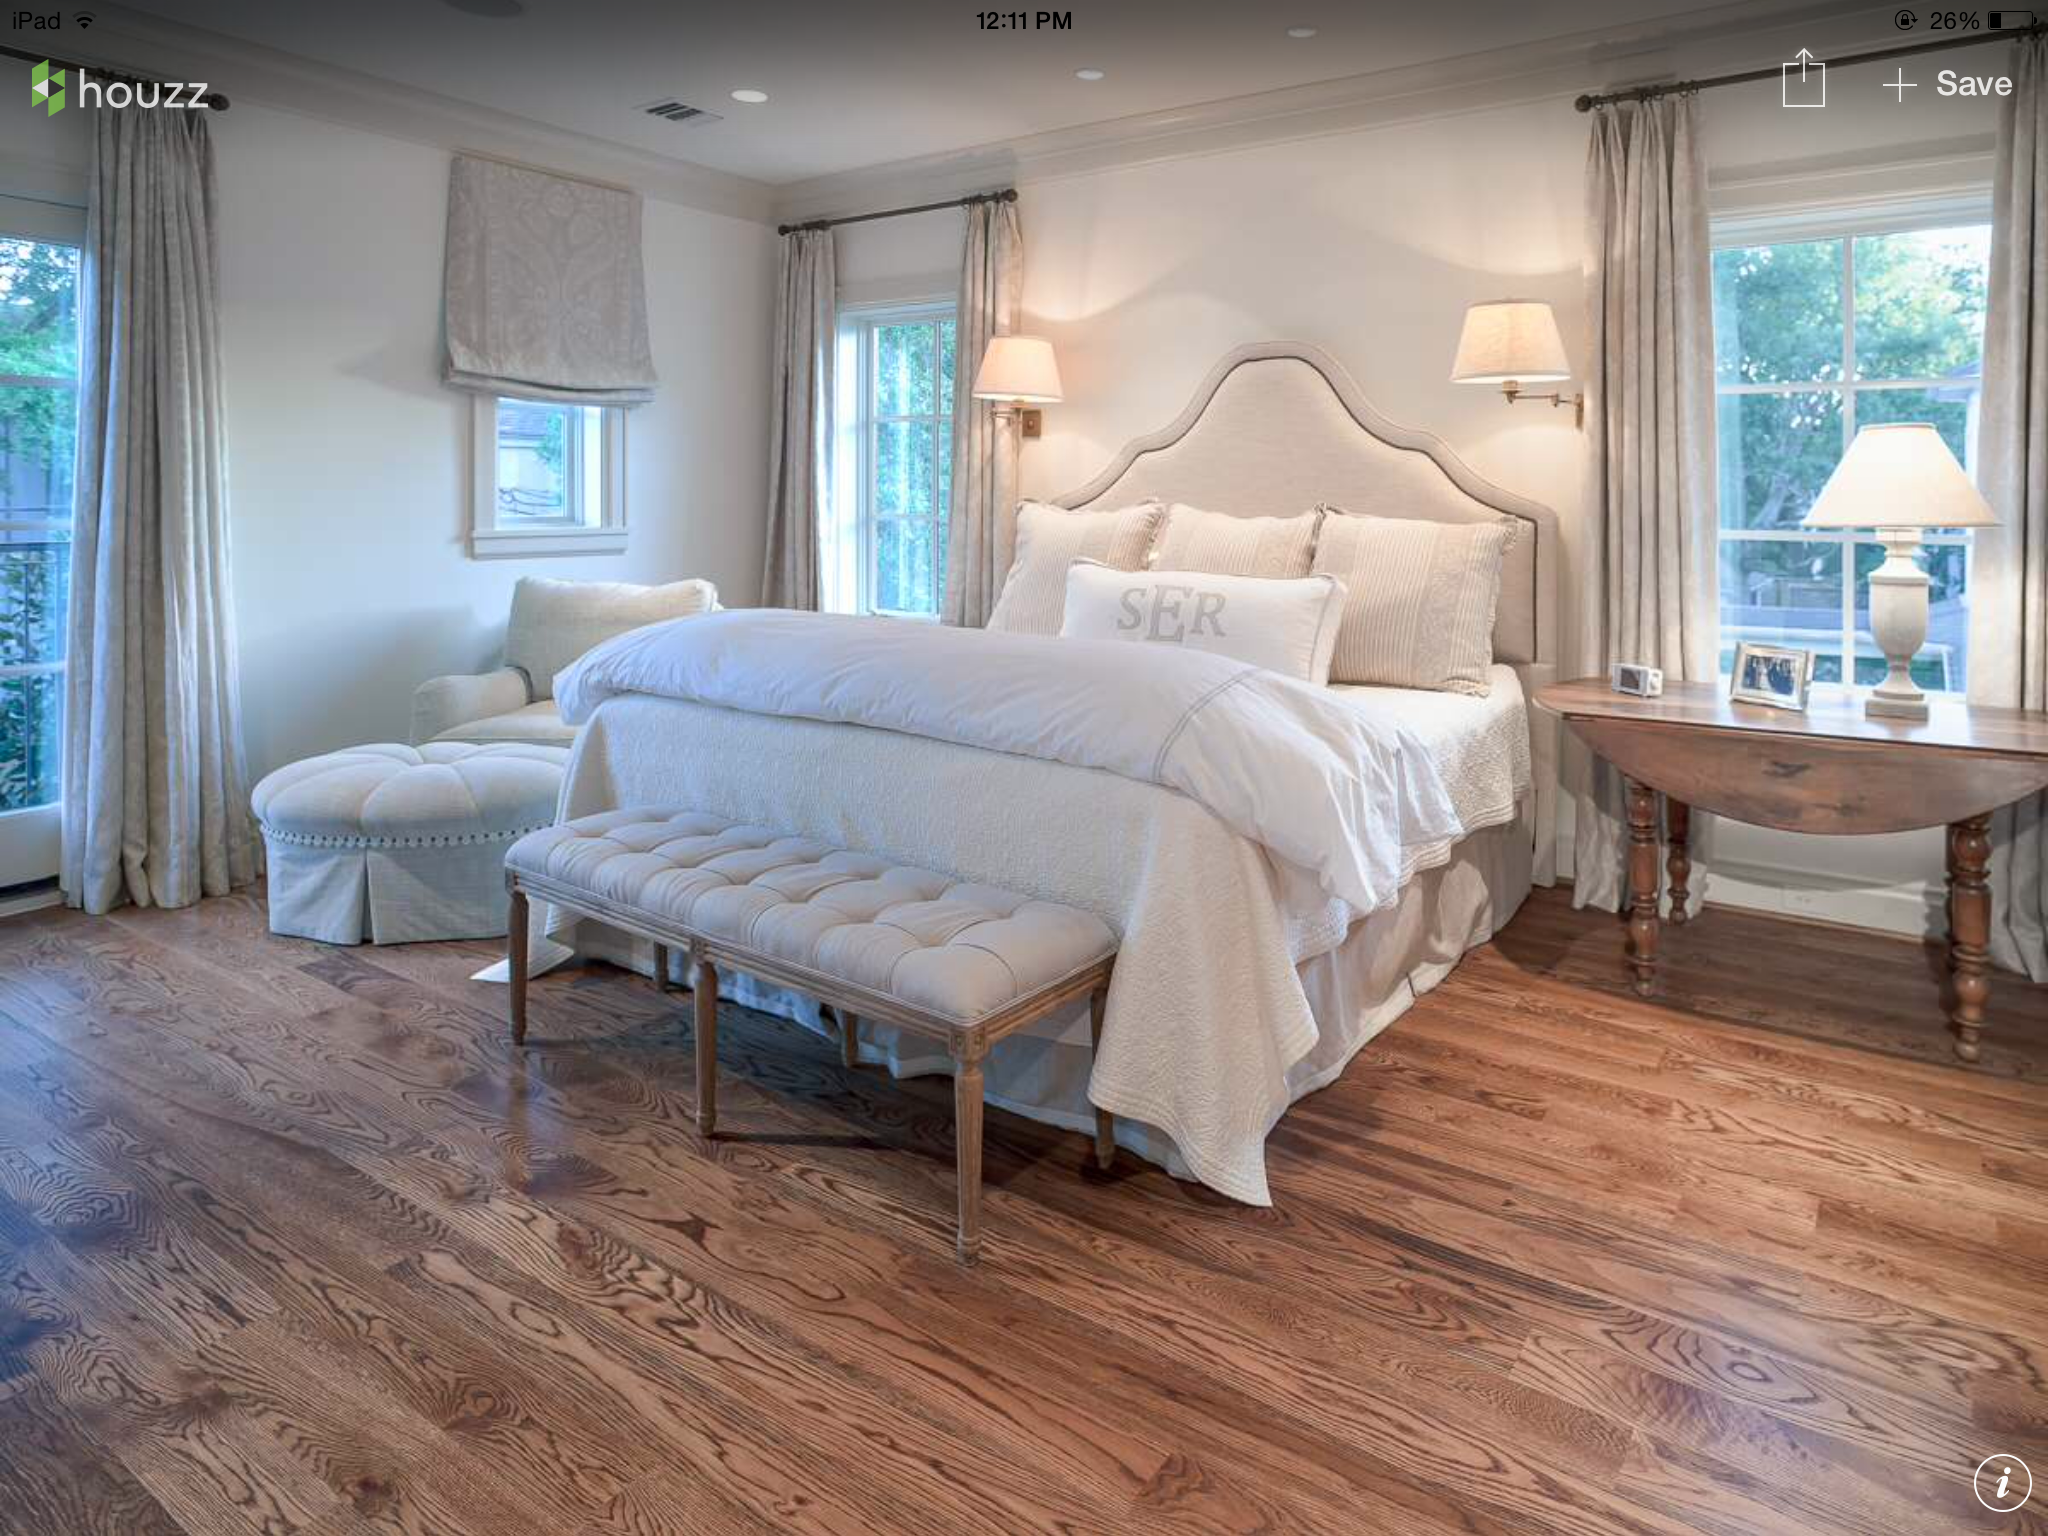 Master bedroom gray walls  Pin by Mica Dicken on Bedroom  Pinterest  Bedrooms Master bedroom